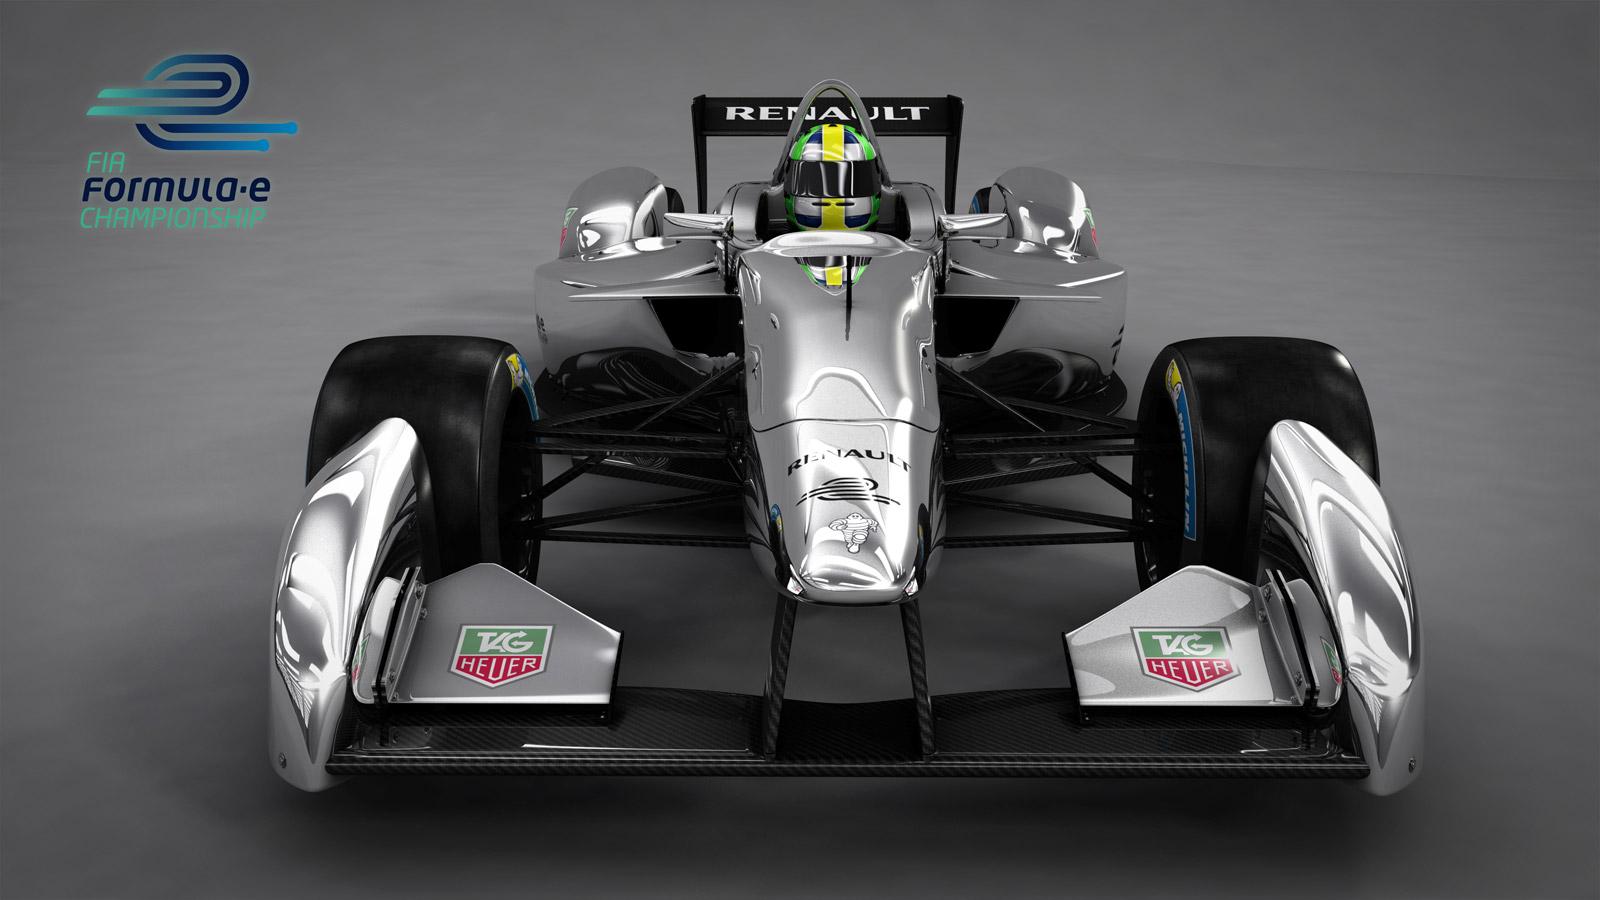 Fox Sports Acquires Broadcast Rights For Formula E